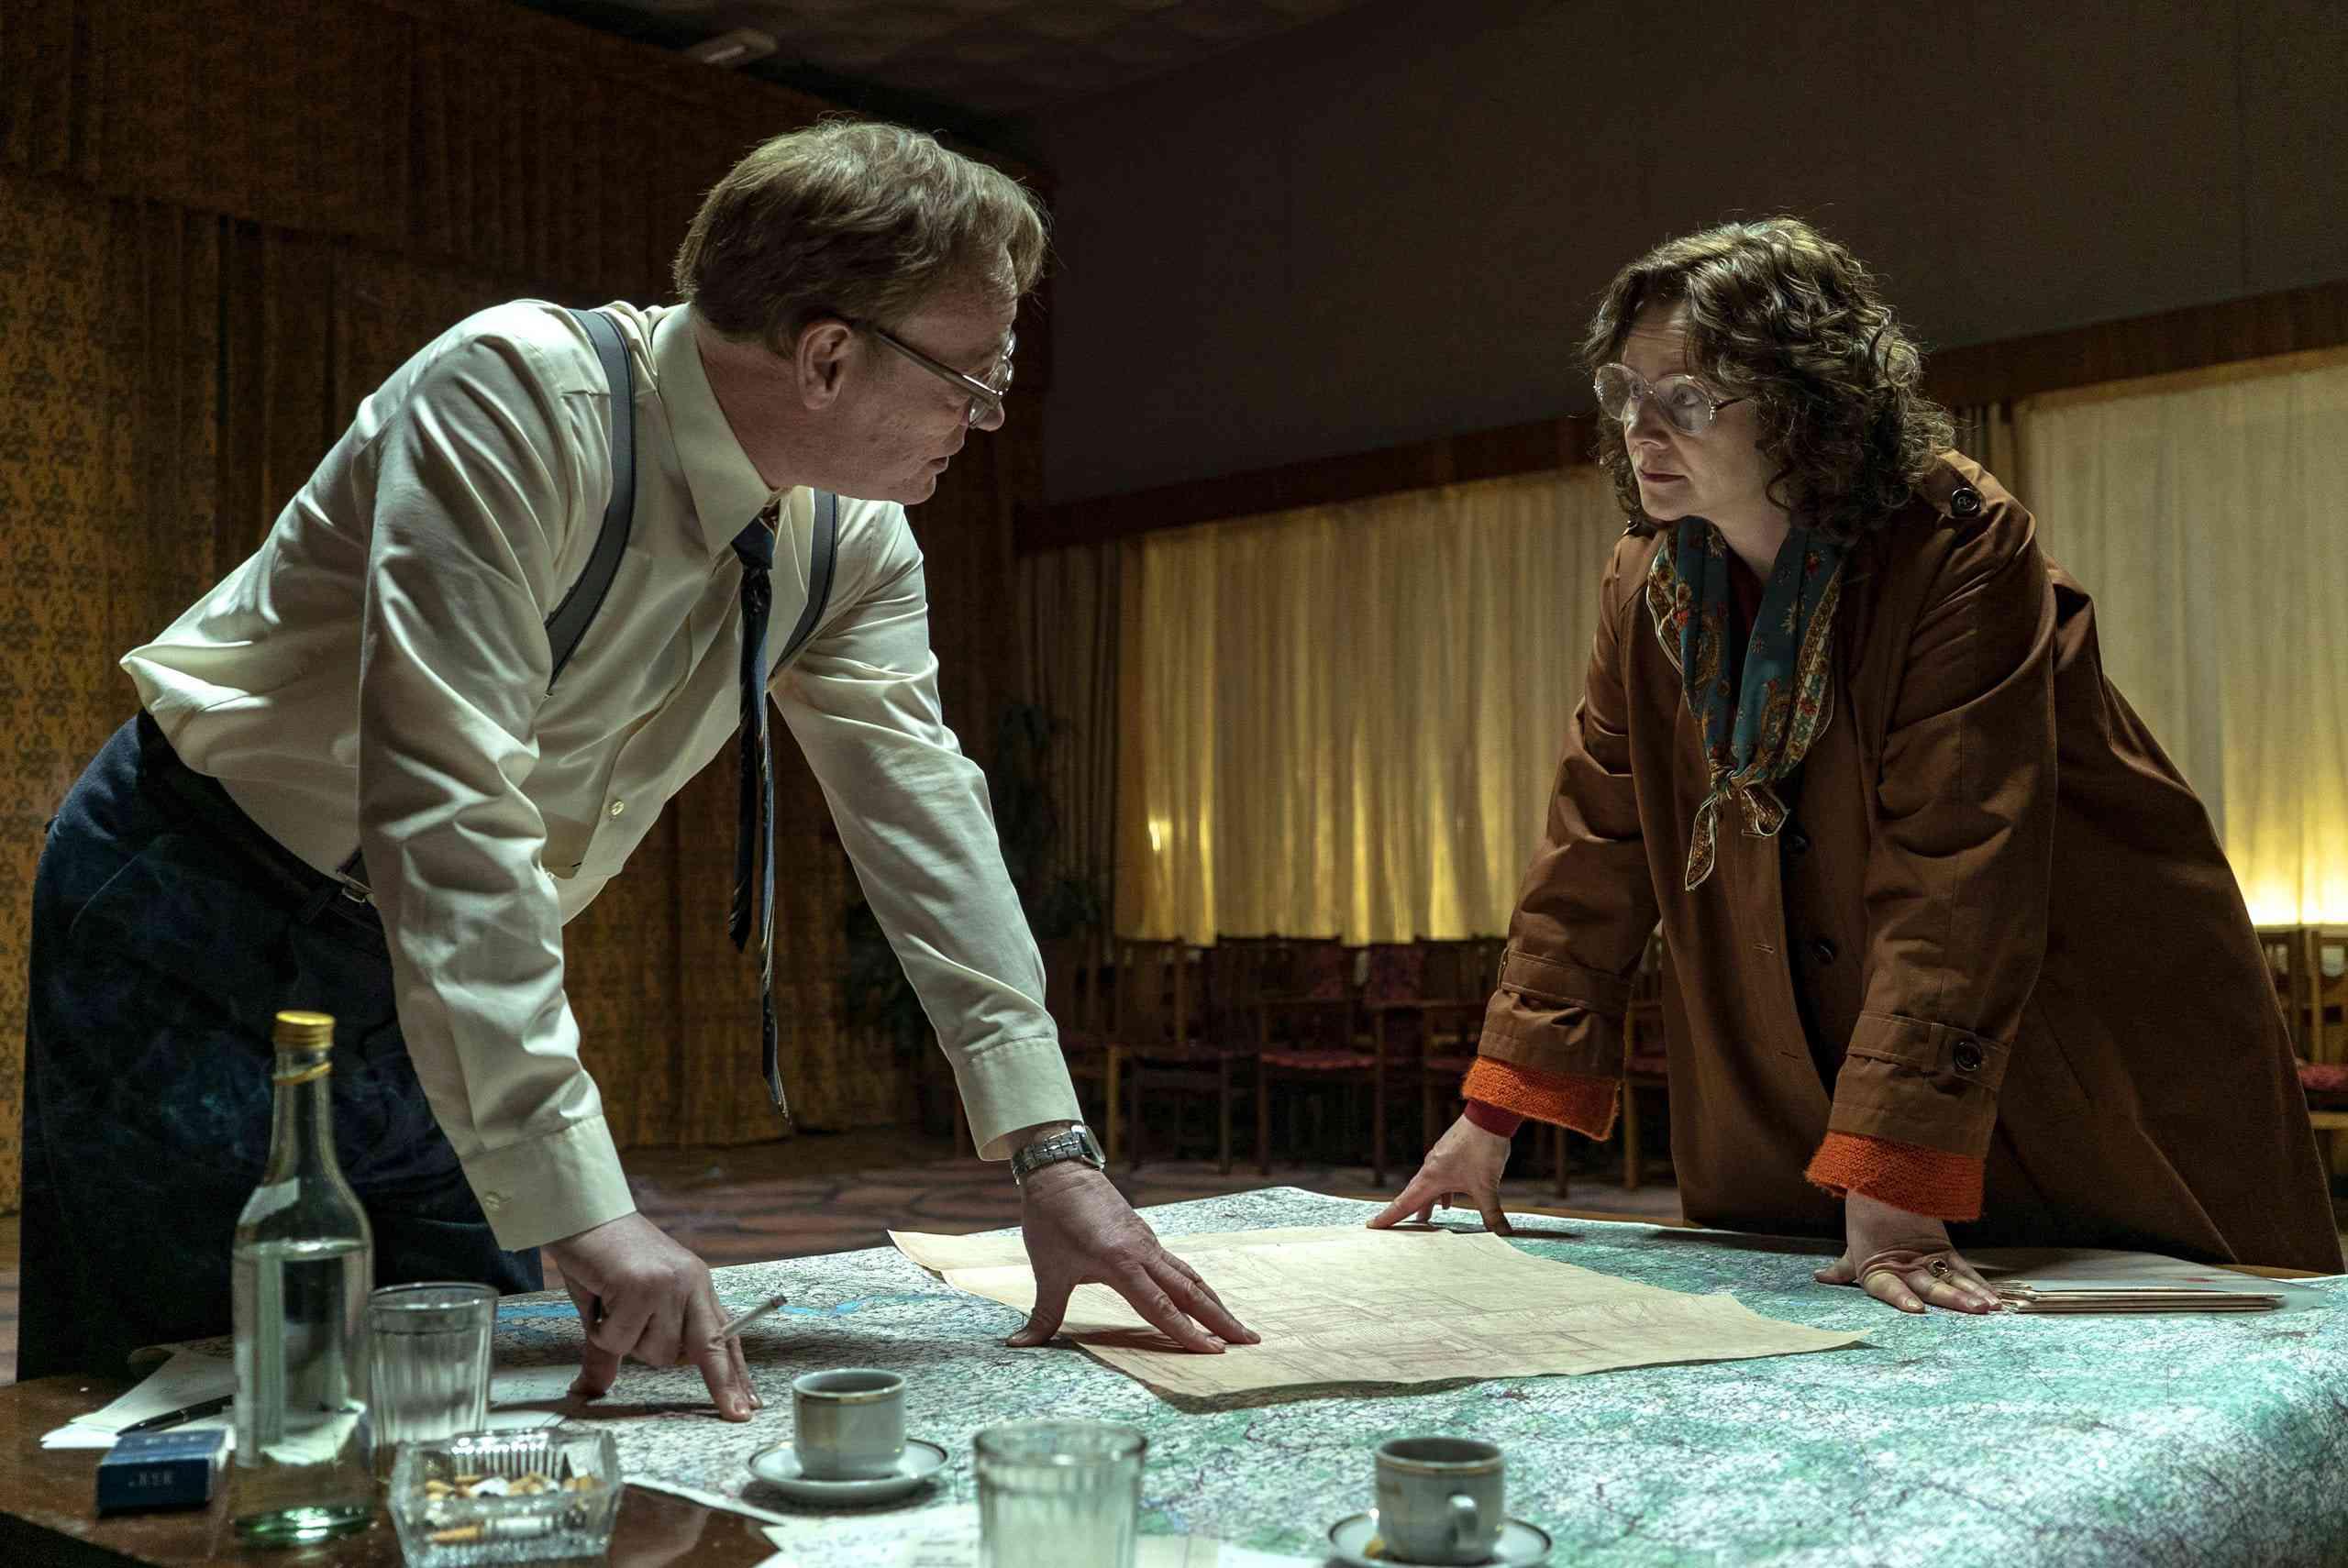 A scene from Chernobyl (2019)